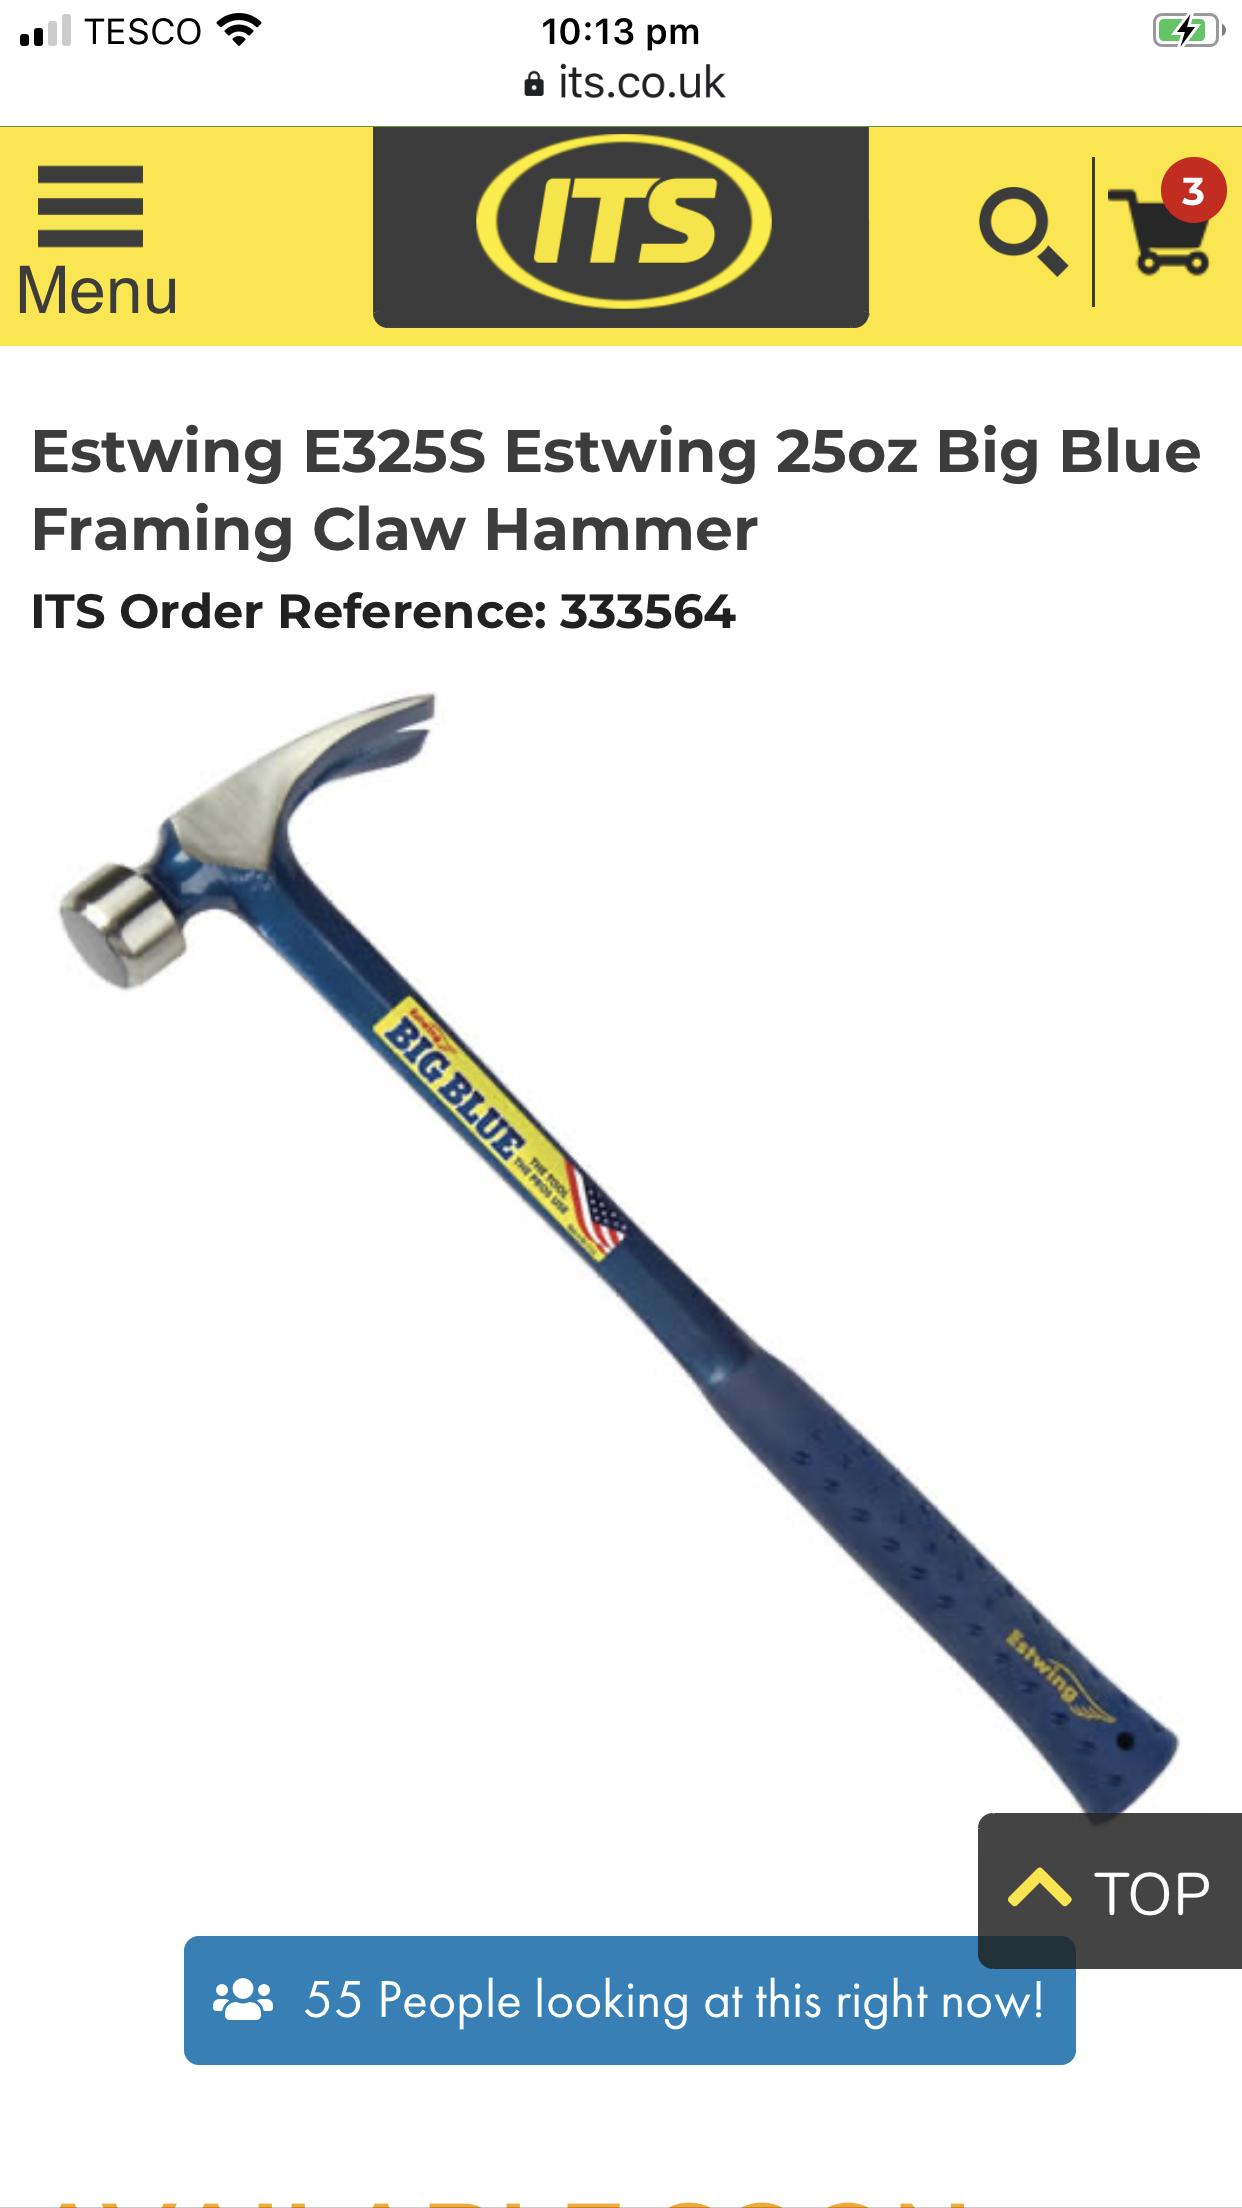 Hammer time.-b7141469-9870-42fe-adfd-abf8b450365f_1593205585328.png